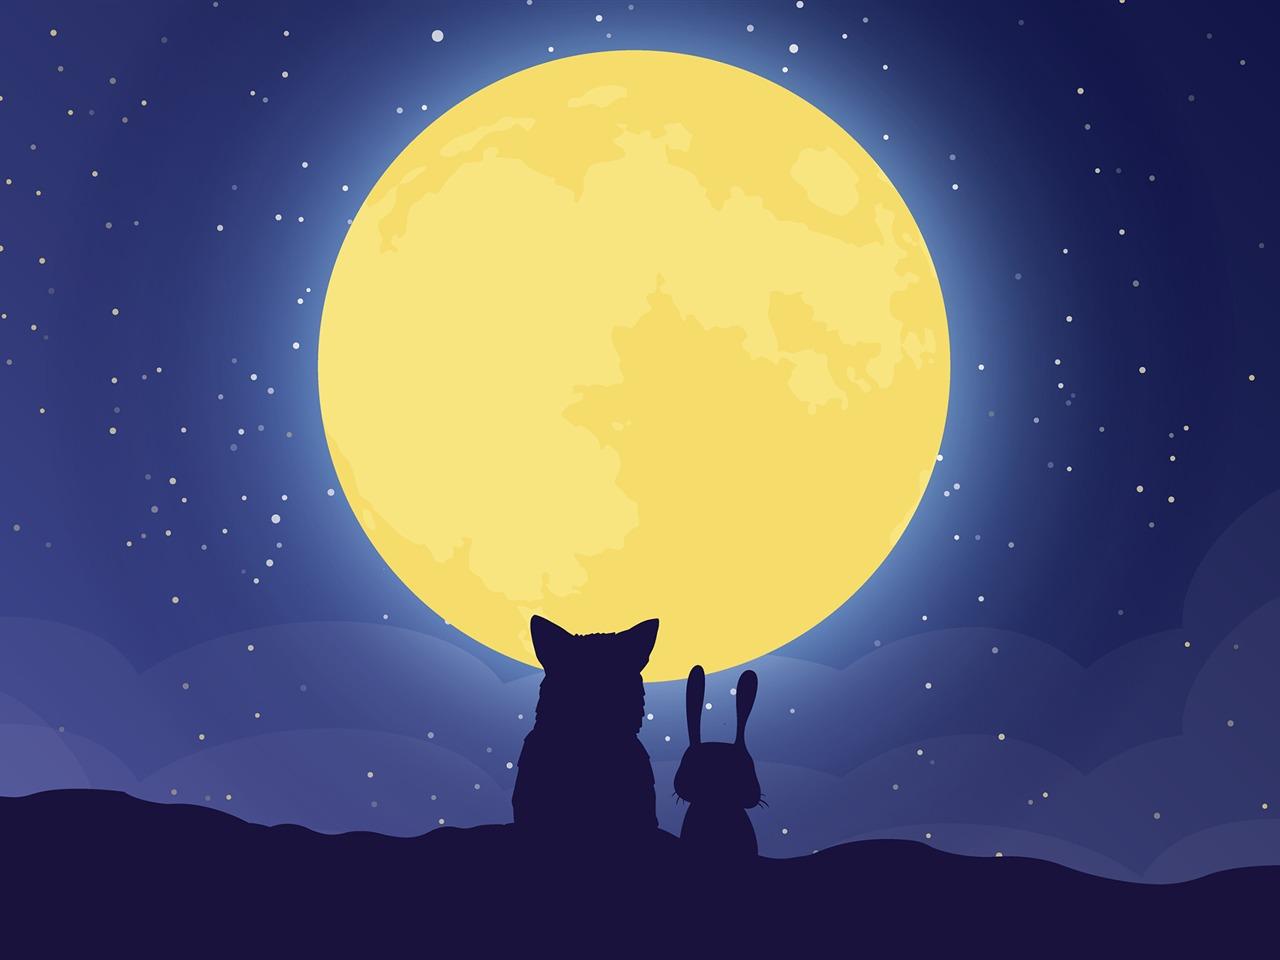 Cartoon Fox Rabbit Full Moon 2017 High Quality Wallpaper